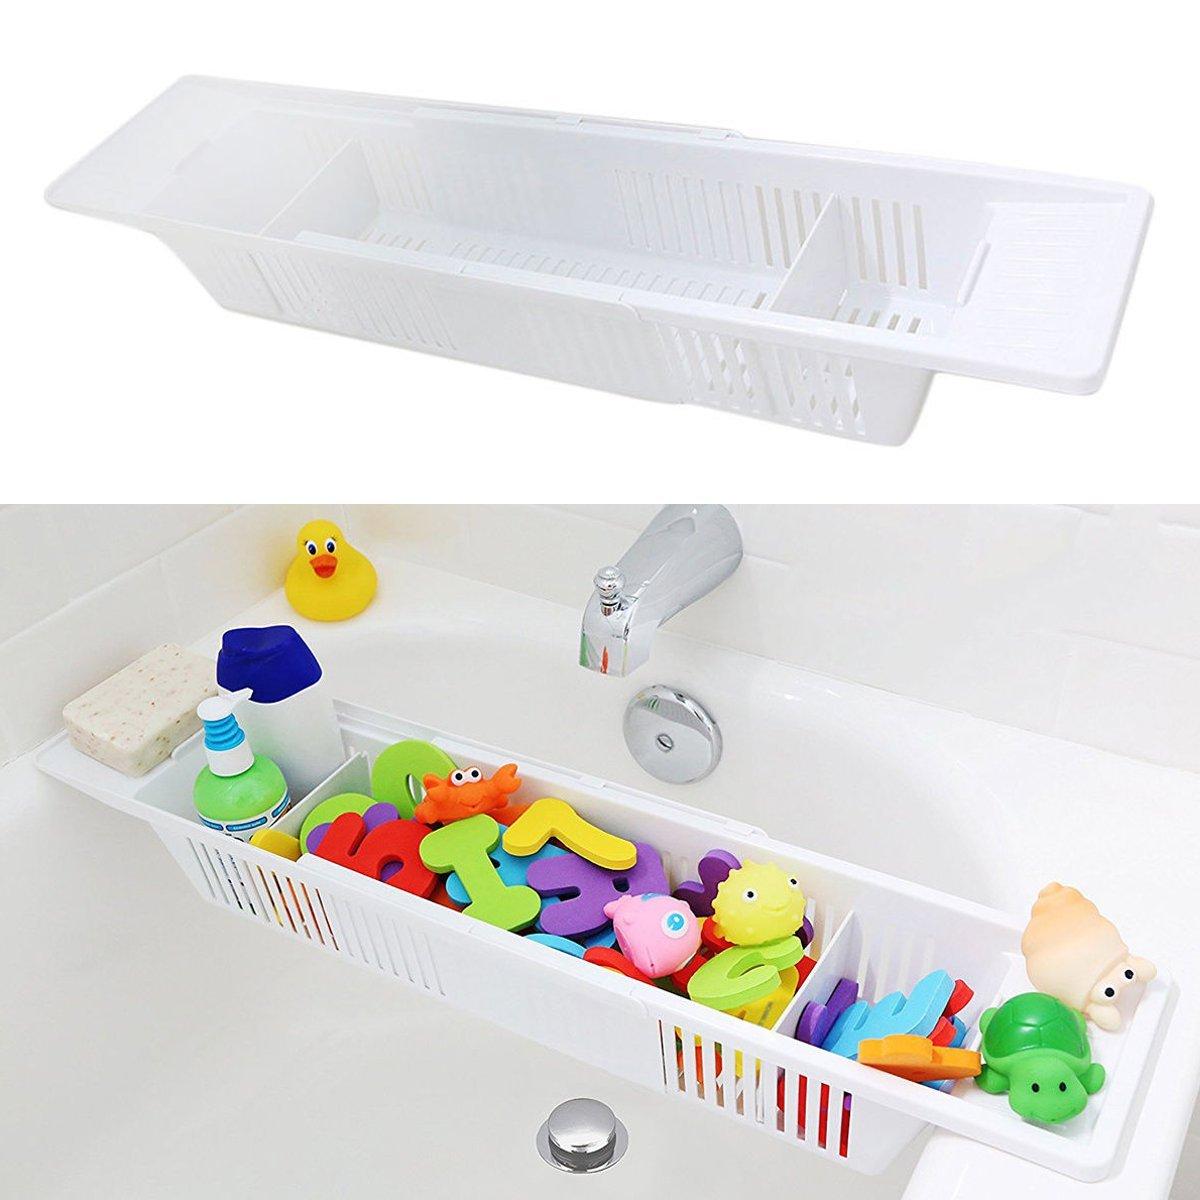 Aissimio Adjustable Bath Toy Organizer Storage Basket Bath Caddy Kids Bath Tub Shower Toy Organizer Holder White 57X14X10cm